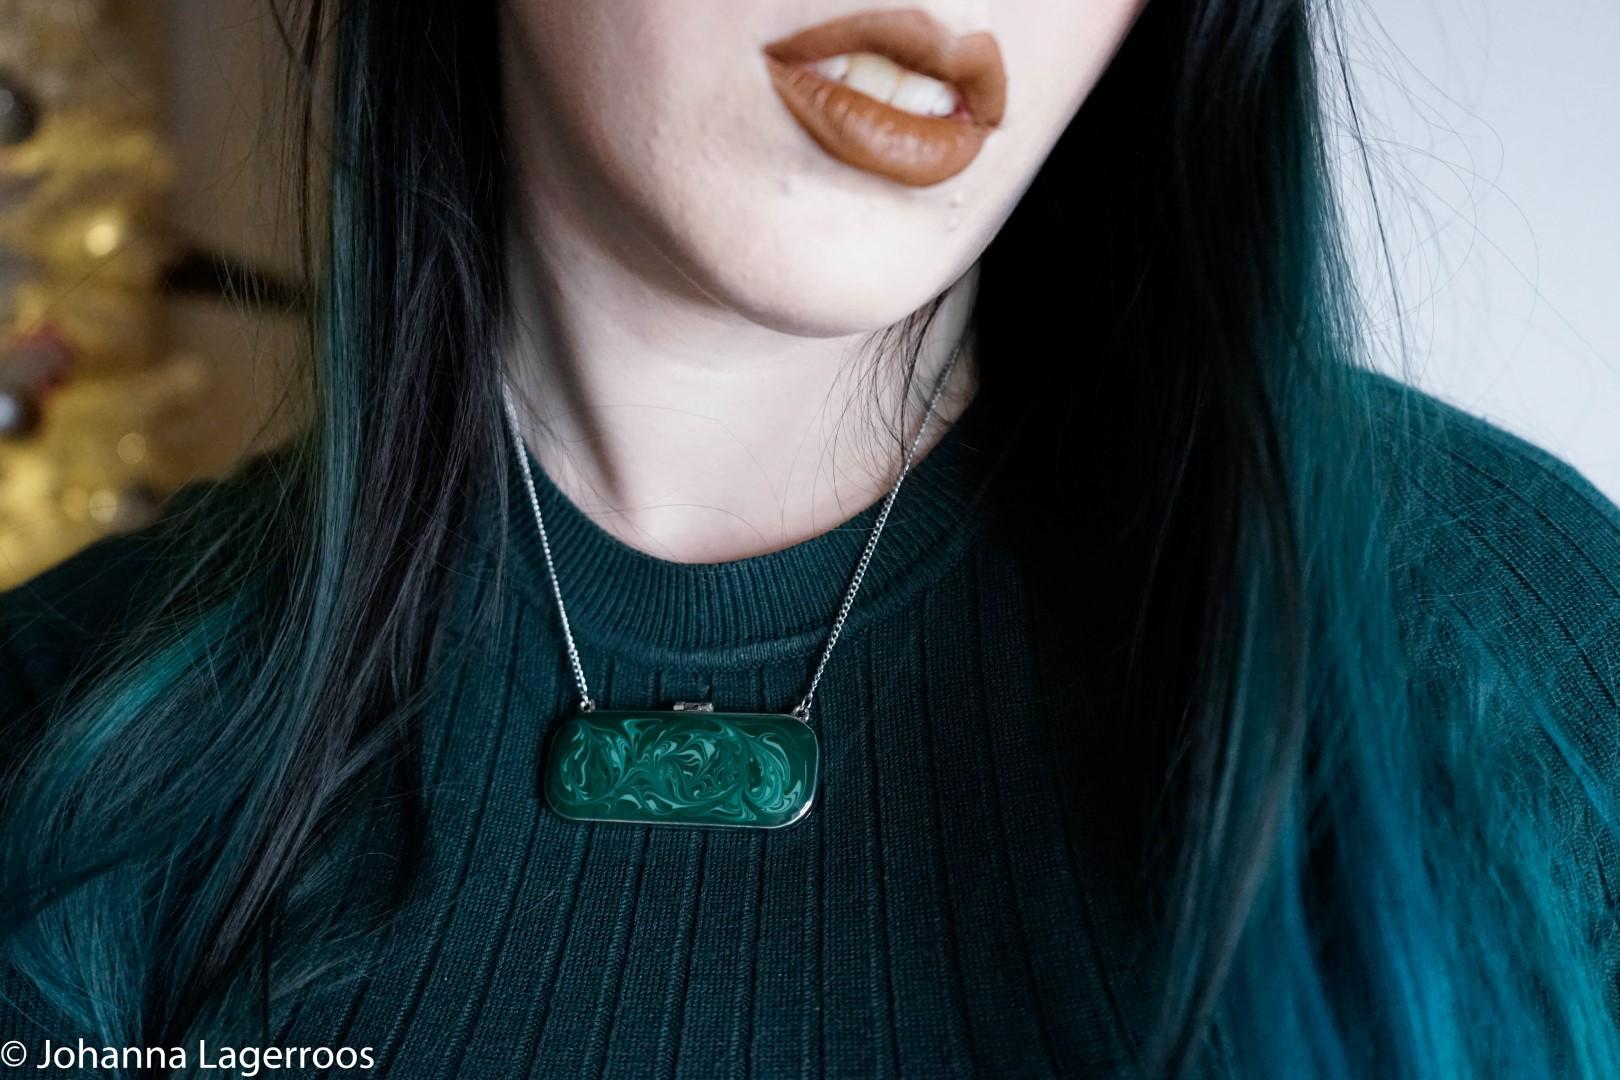 MintMongoose necklace